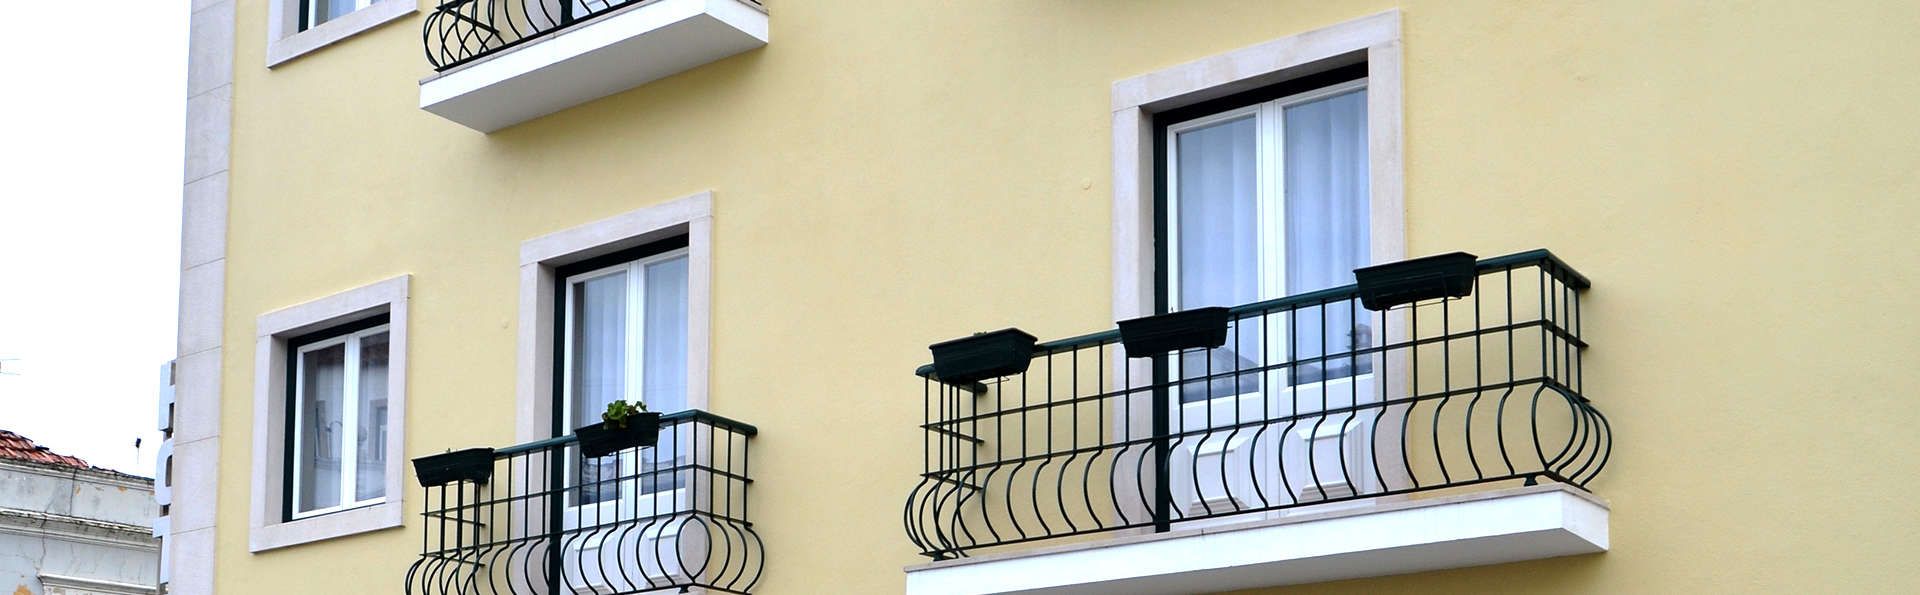 Hotel Torres Novas - Edit_Front2.jpg